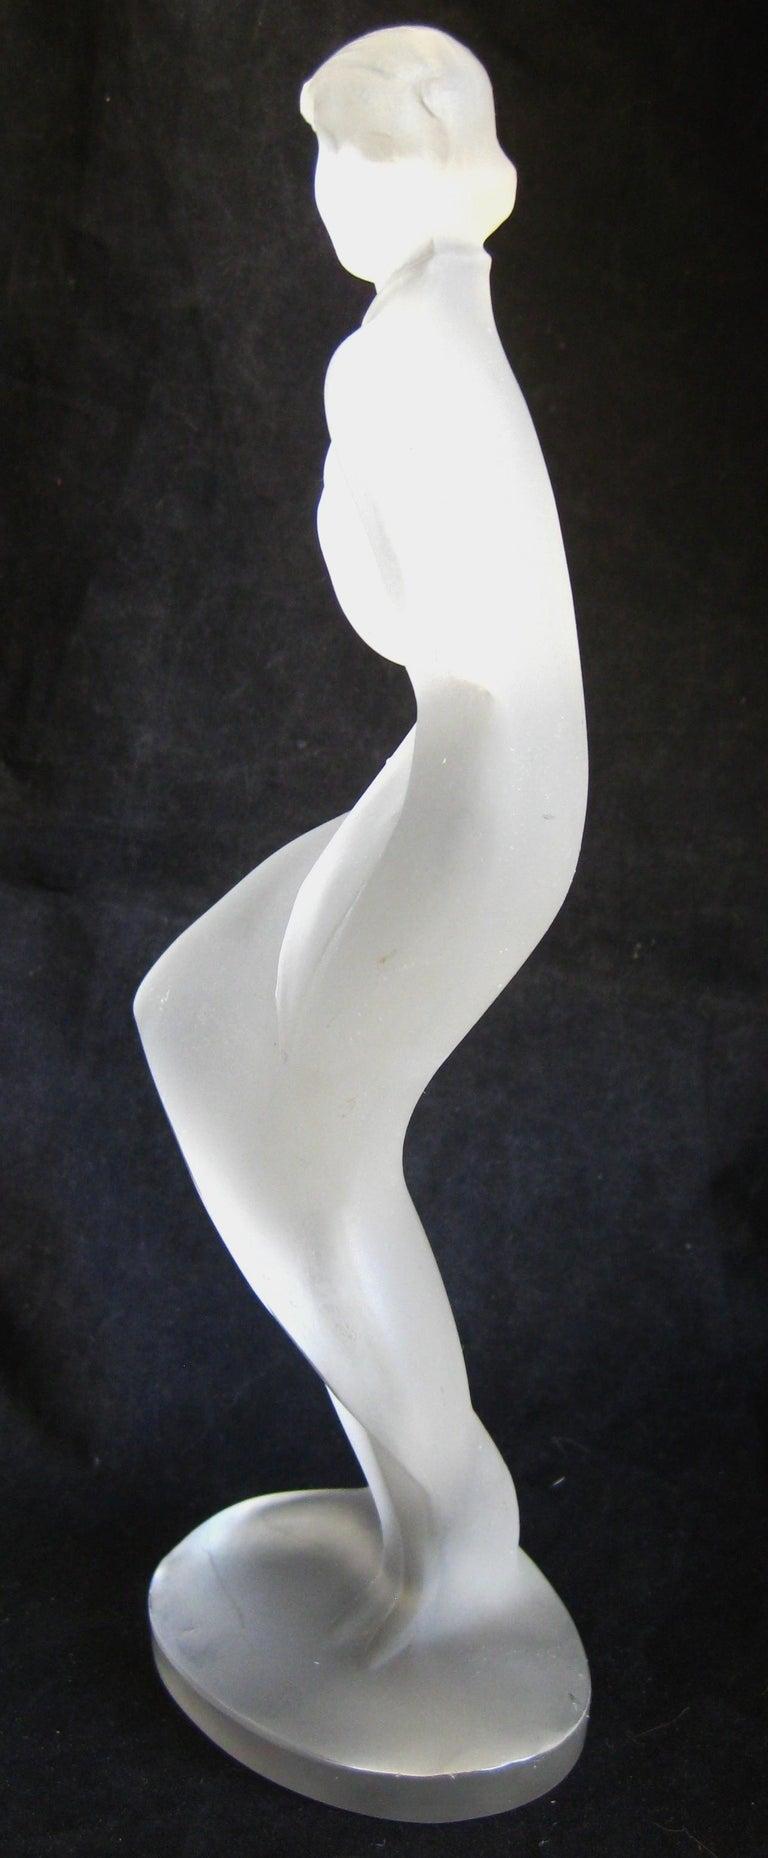 Art Glass Czech Bohemian Curt Schlevogt Ingrid Art Deco Lady in the Wind Glass Statue For Sale